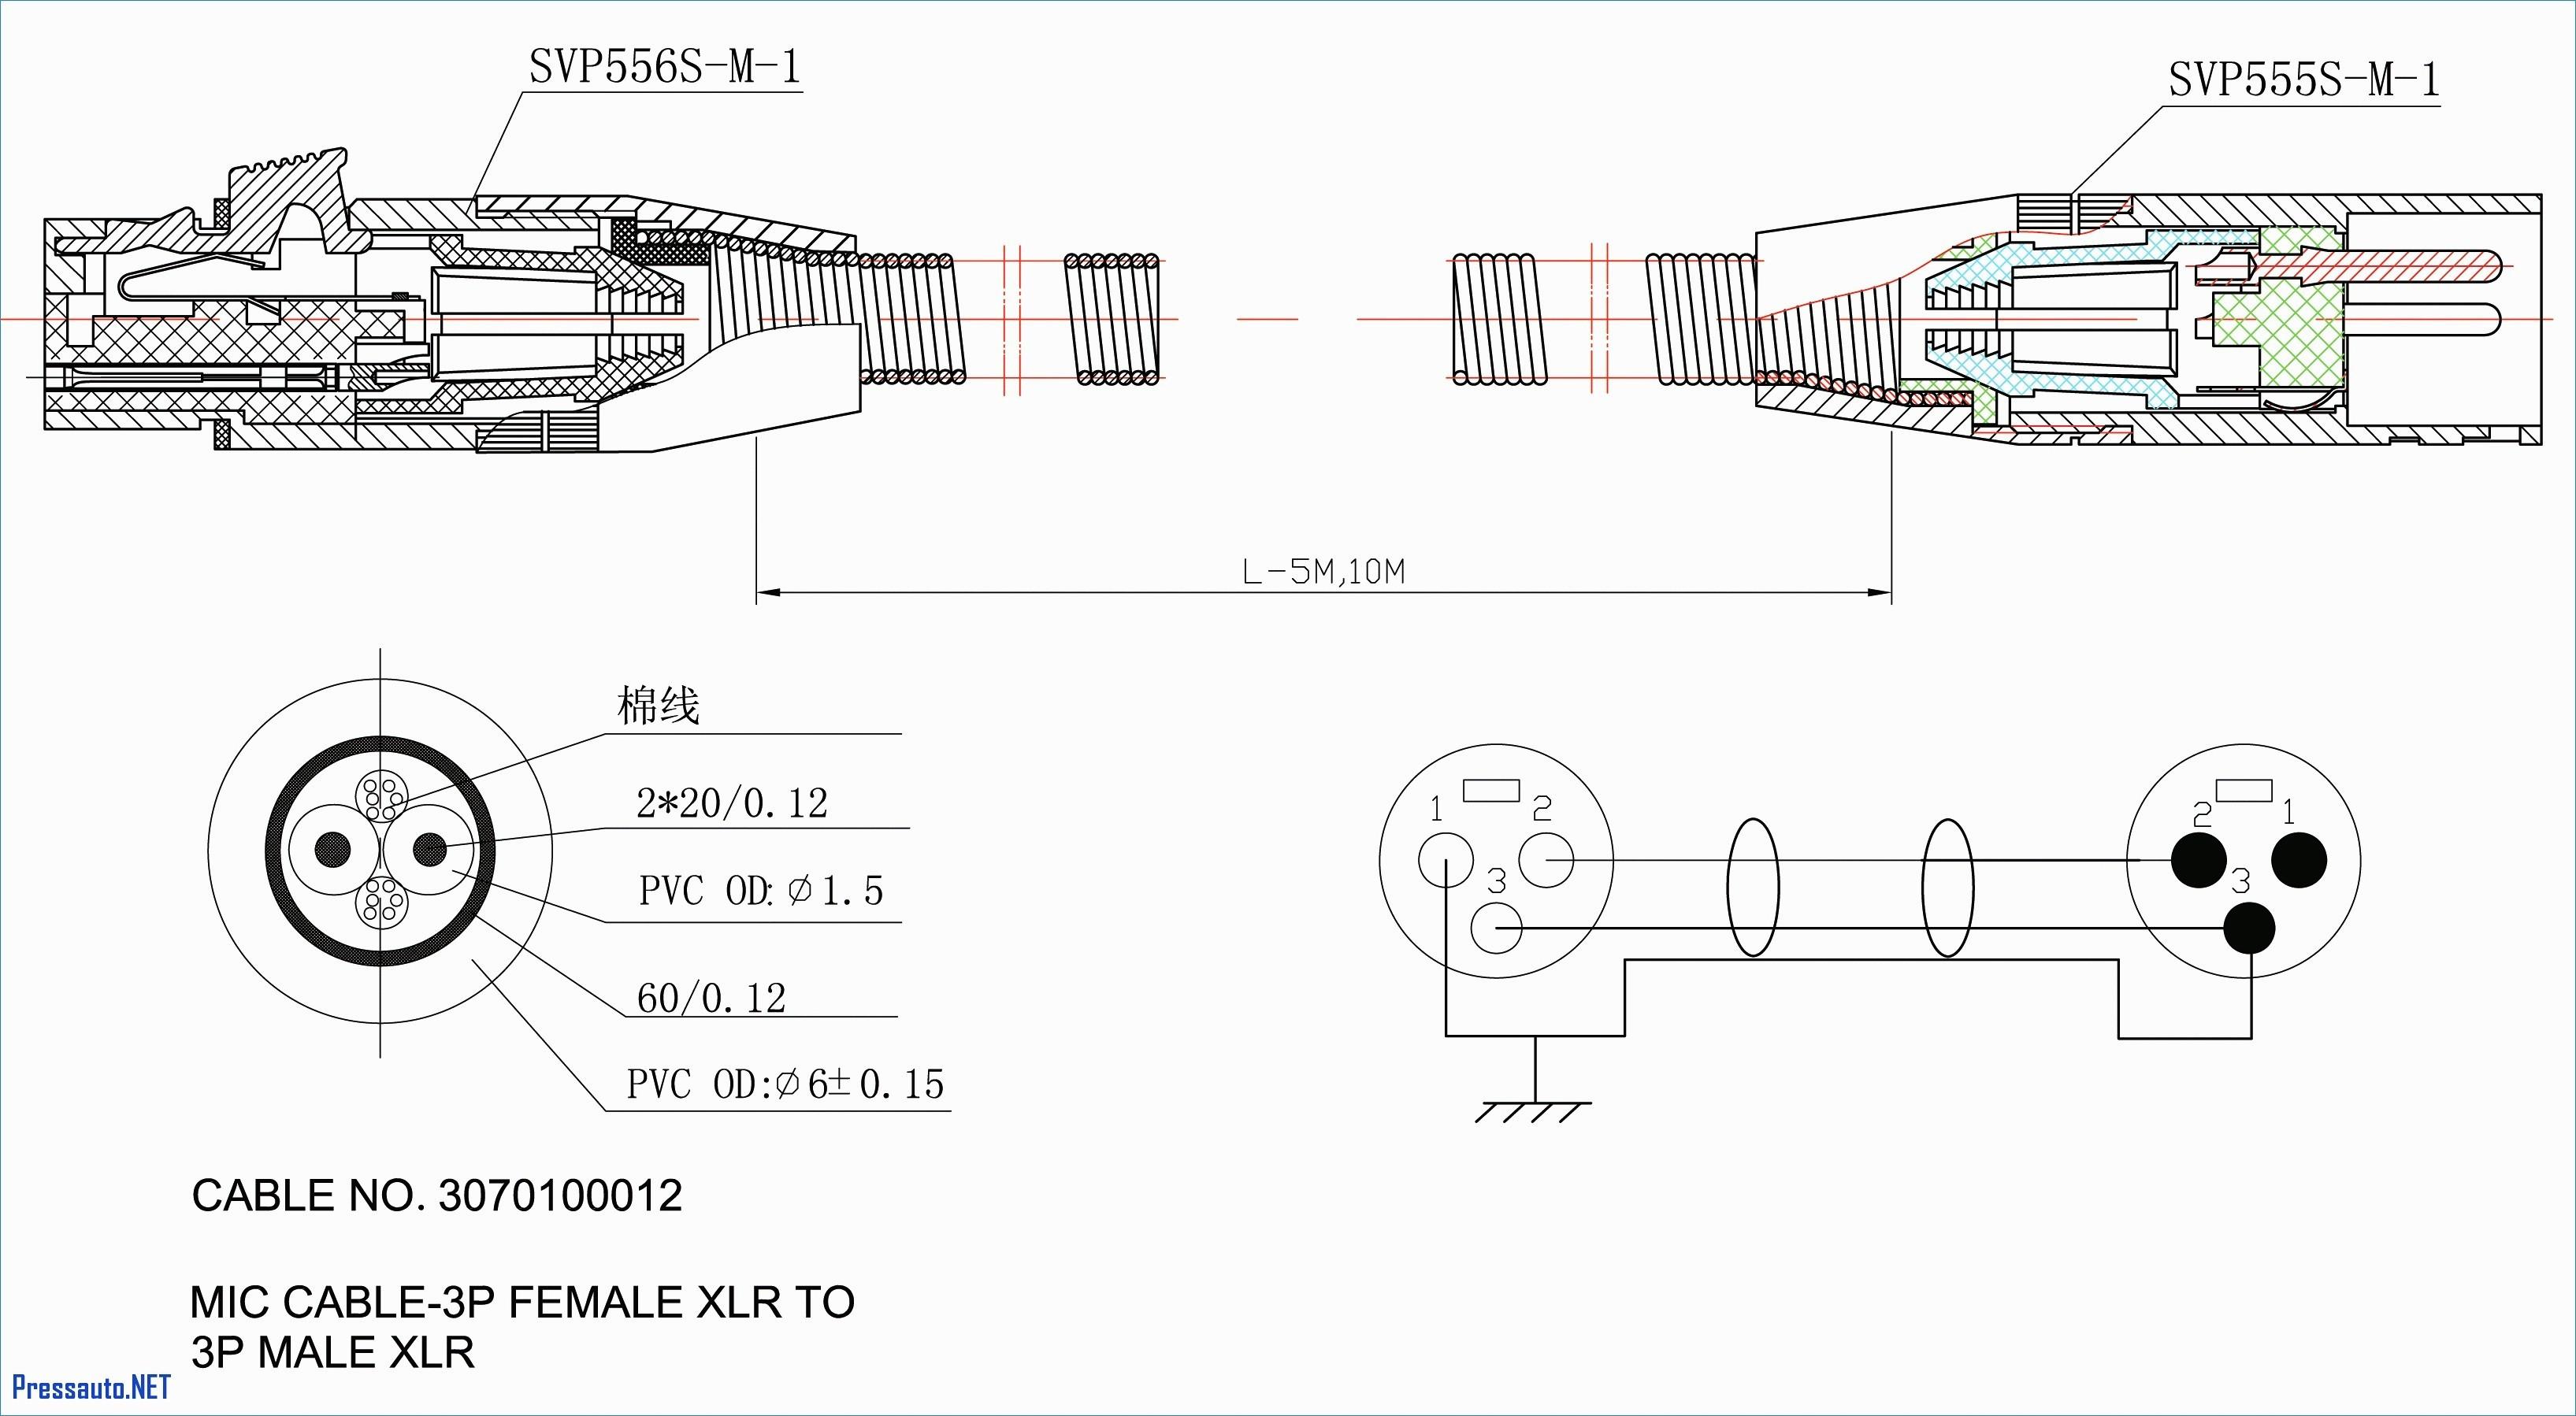 [SCHEMATICS_4ER]  144E539 Chrysler Pacifica Amp Wiring Diagram | Wiring Resources | 05 Chrysler Pacifica Engine Diagram |  | Wiring Resources